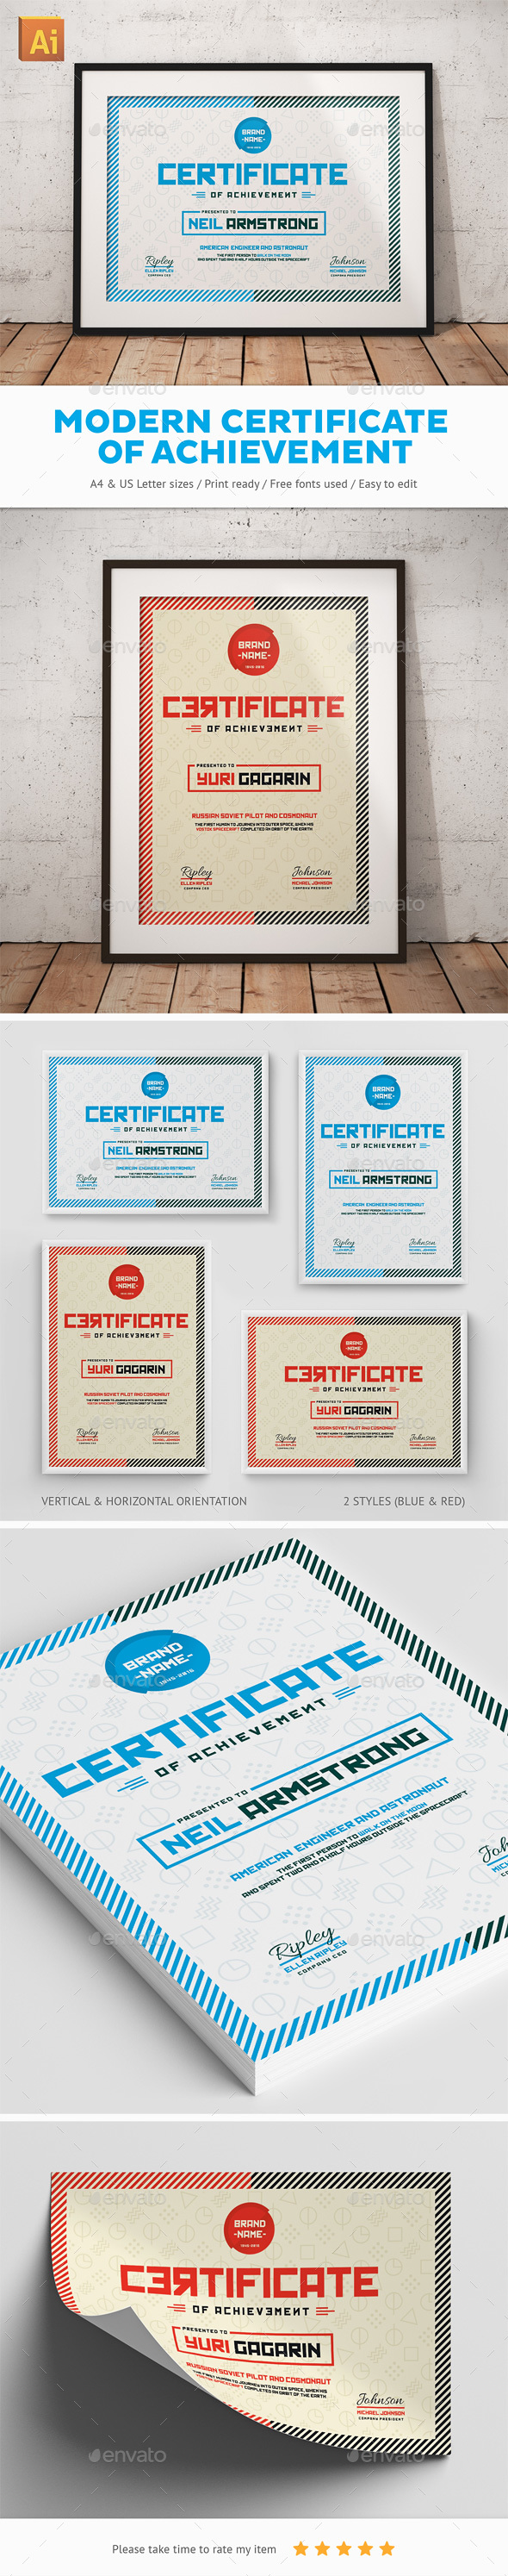 Modern certificate of achievement by snowboy graphicriver modern certificate of achievement certificates stationery xflitez Choice Image